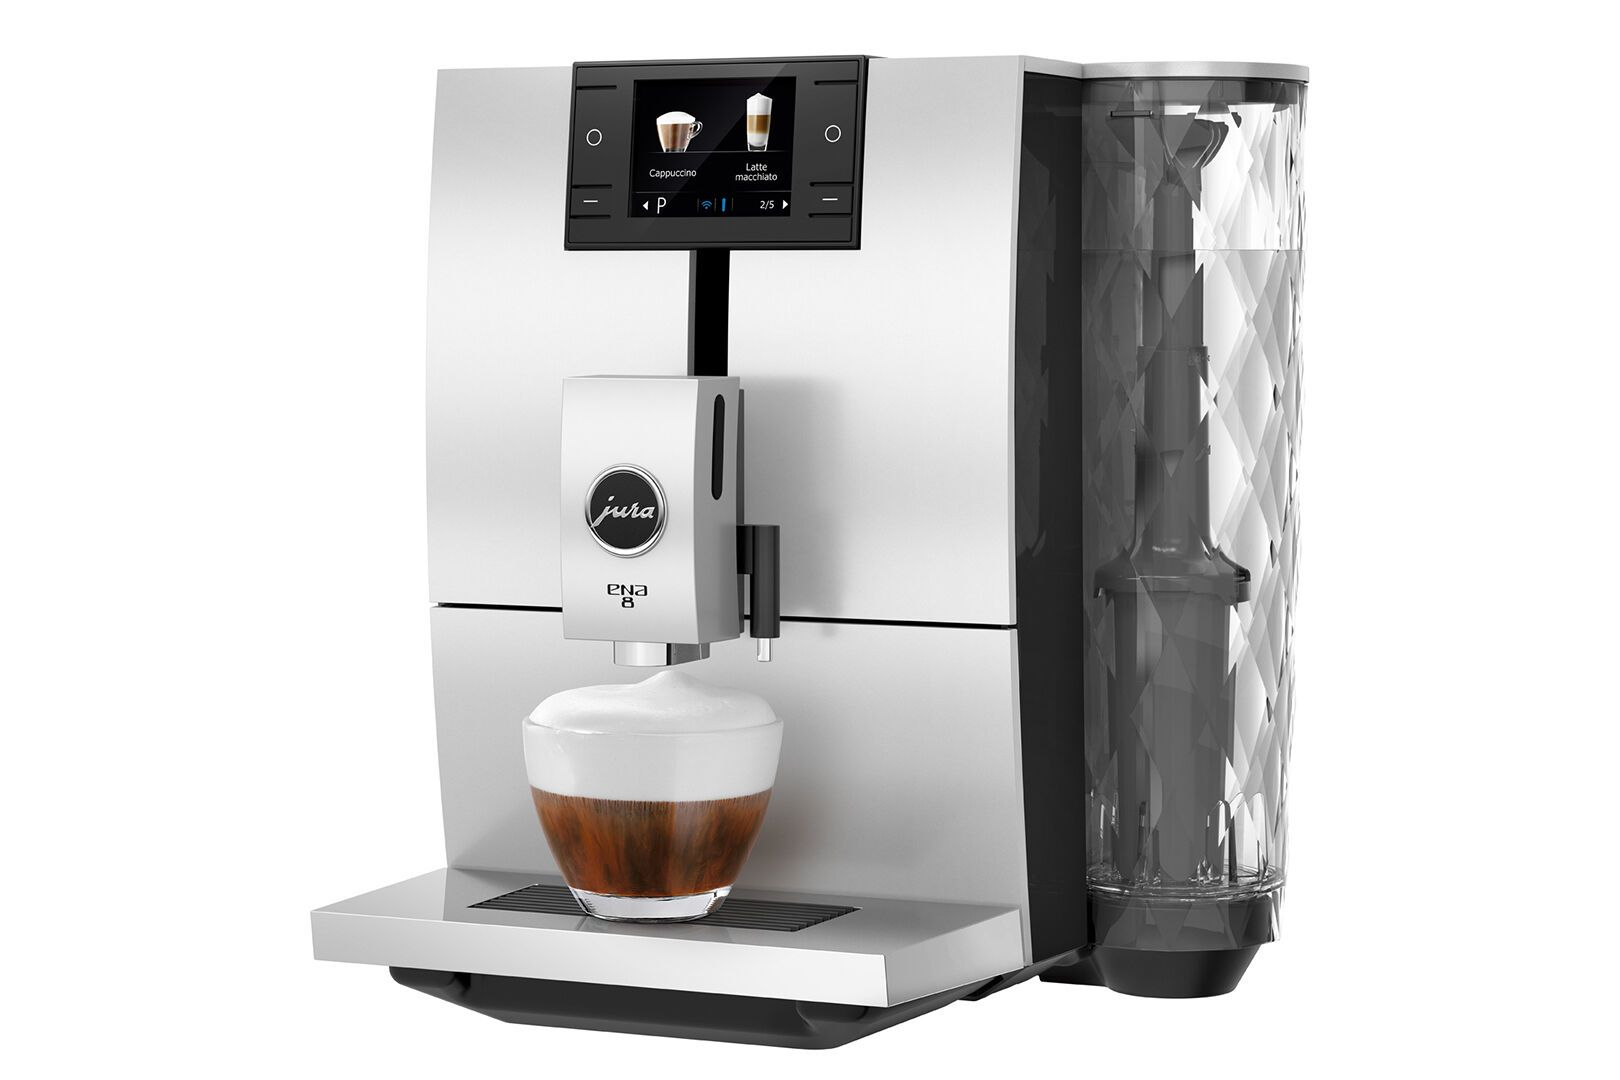 Detailed Study On The Jura Office Coffee Machine